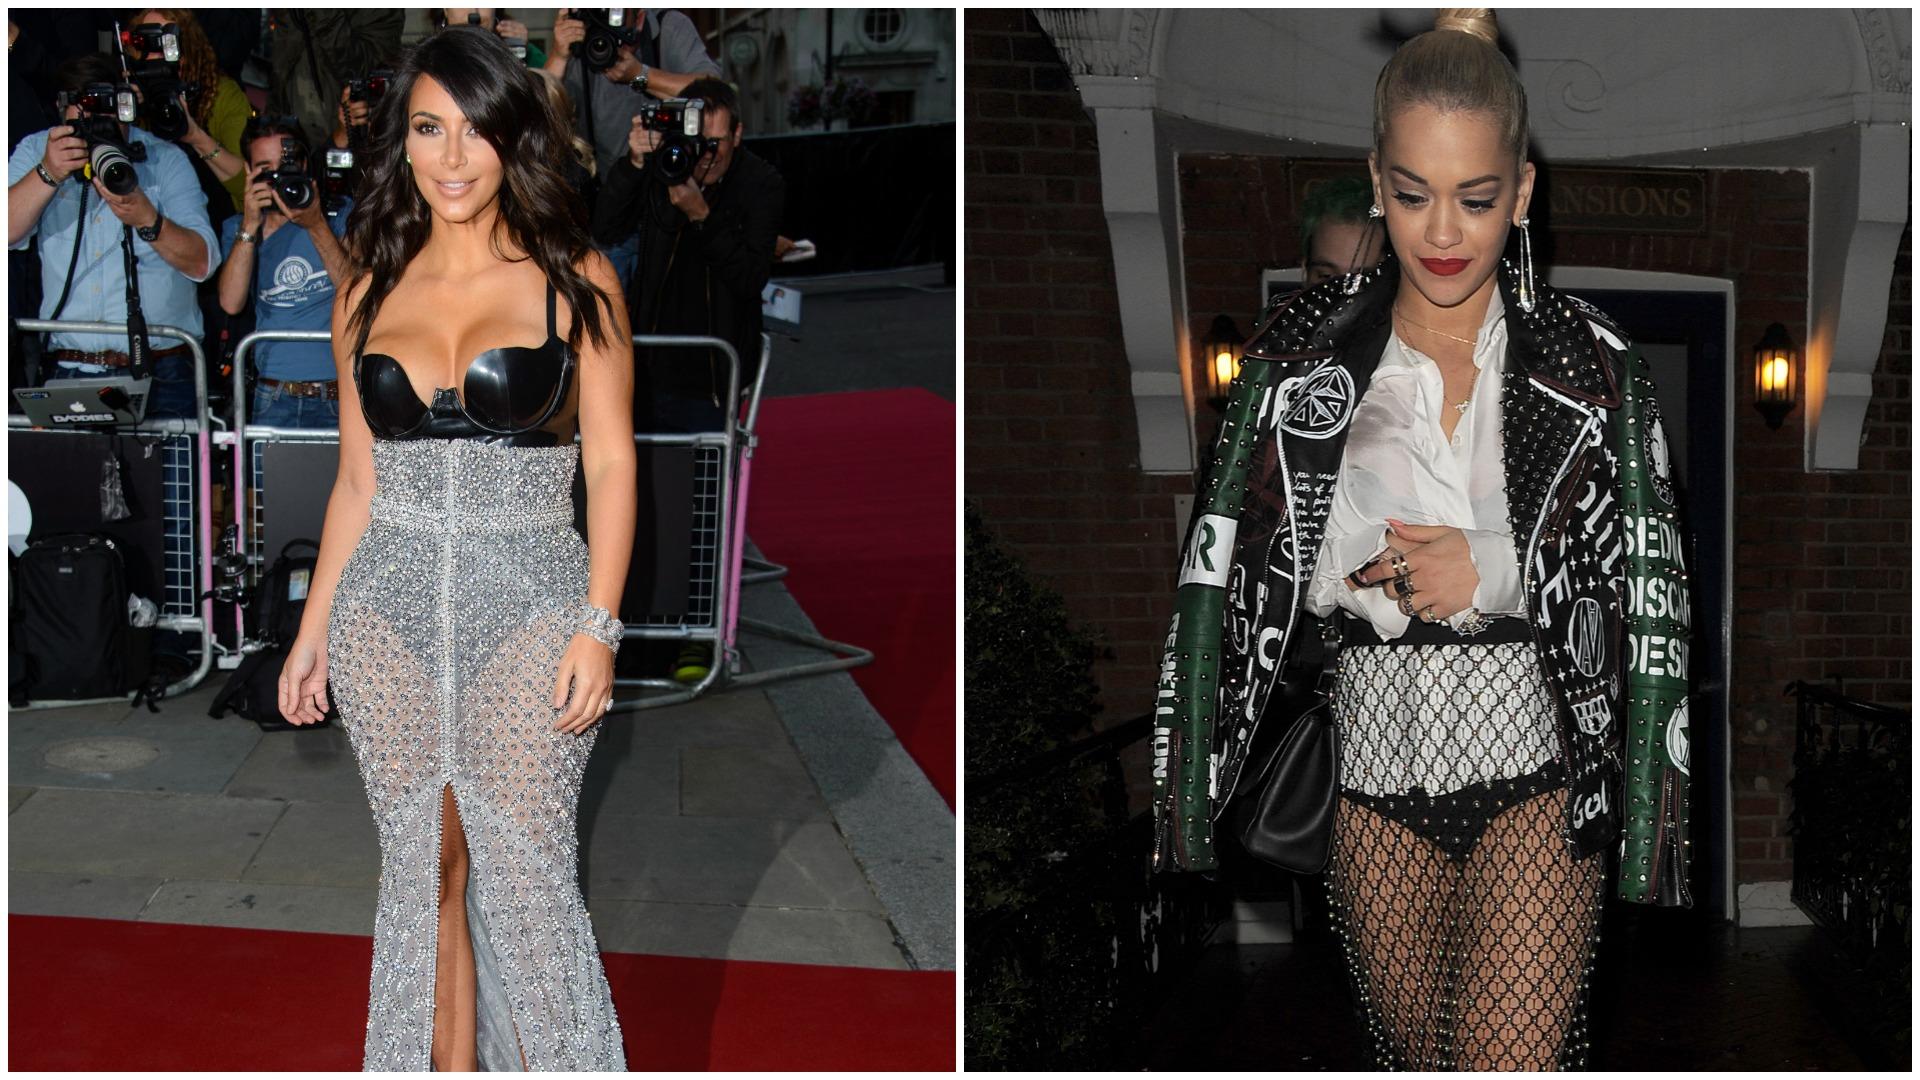 Kim Kardashian Rita Ora showing their underwear